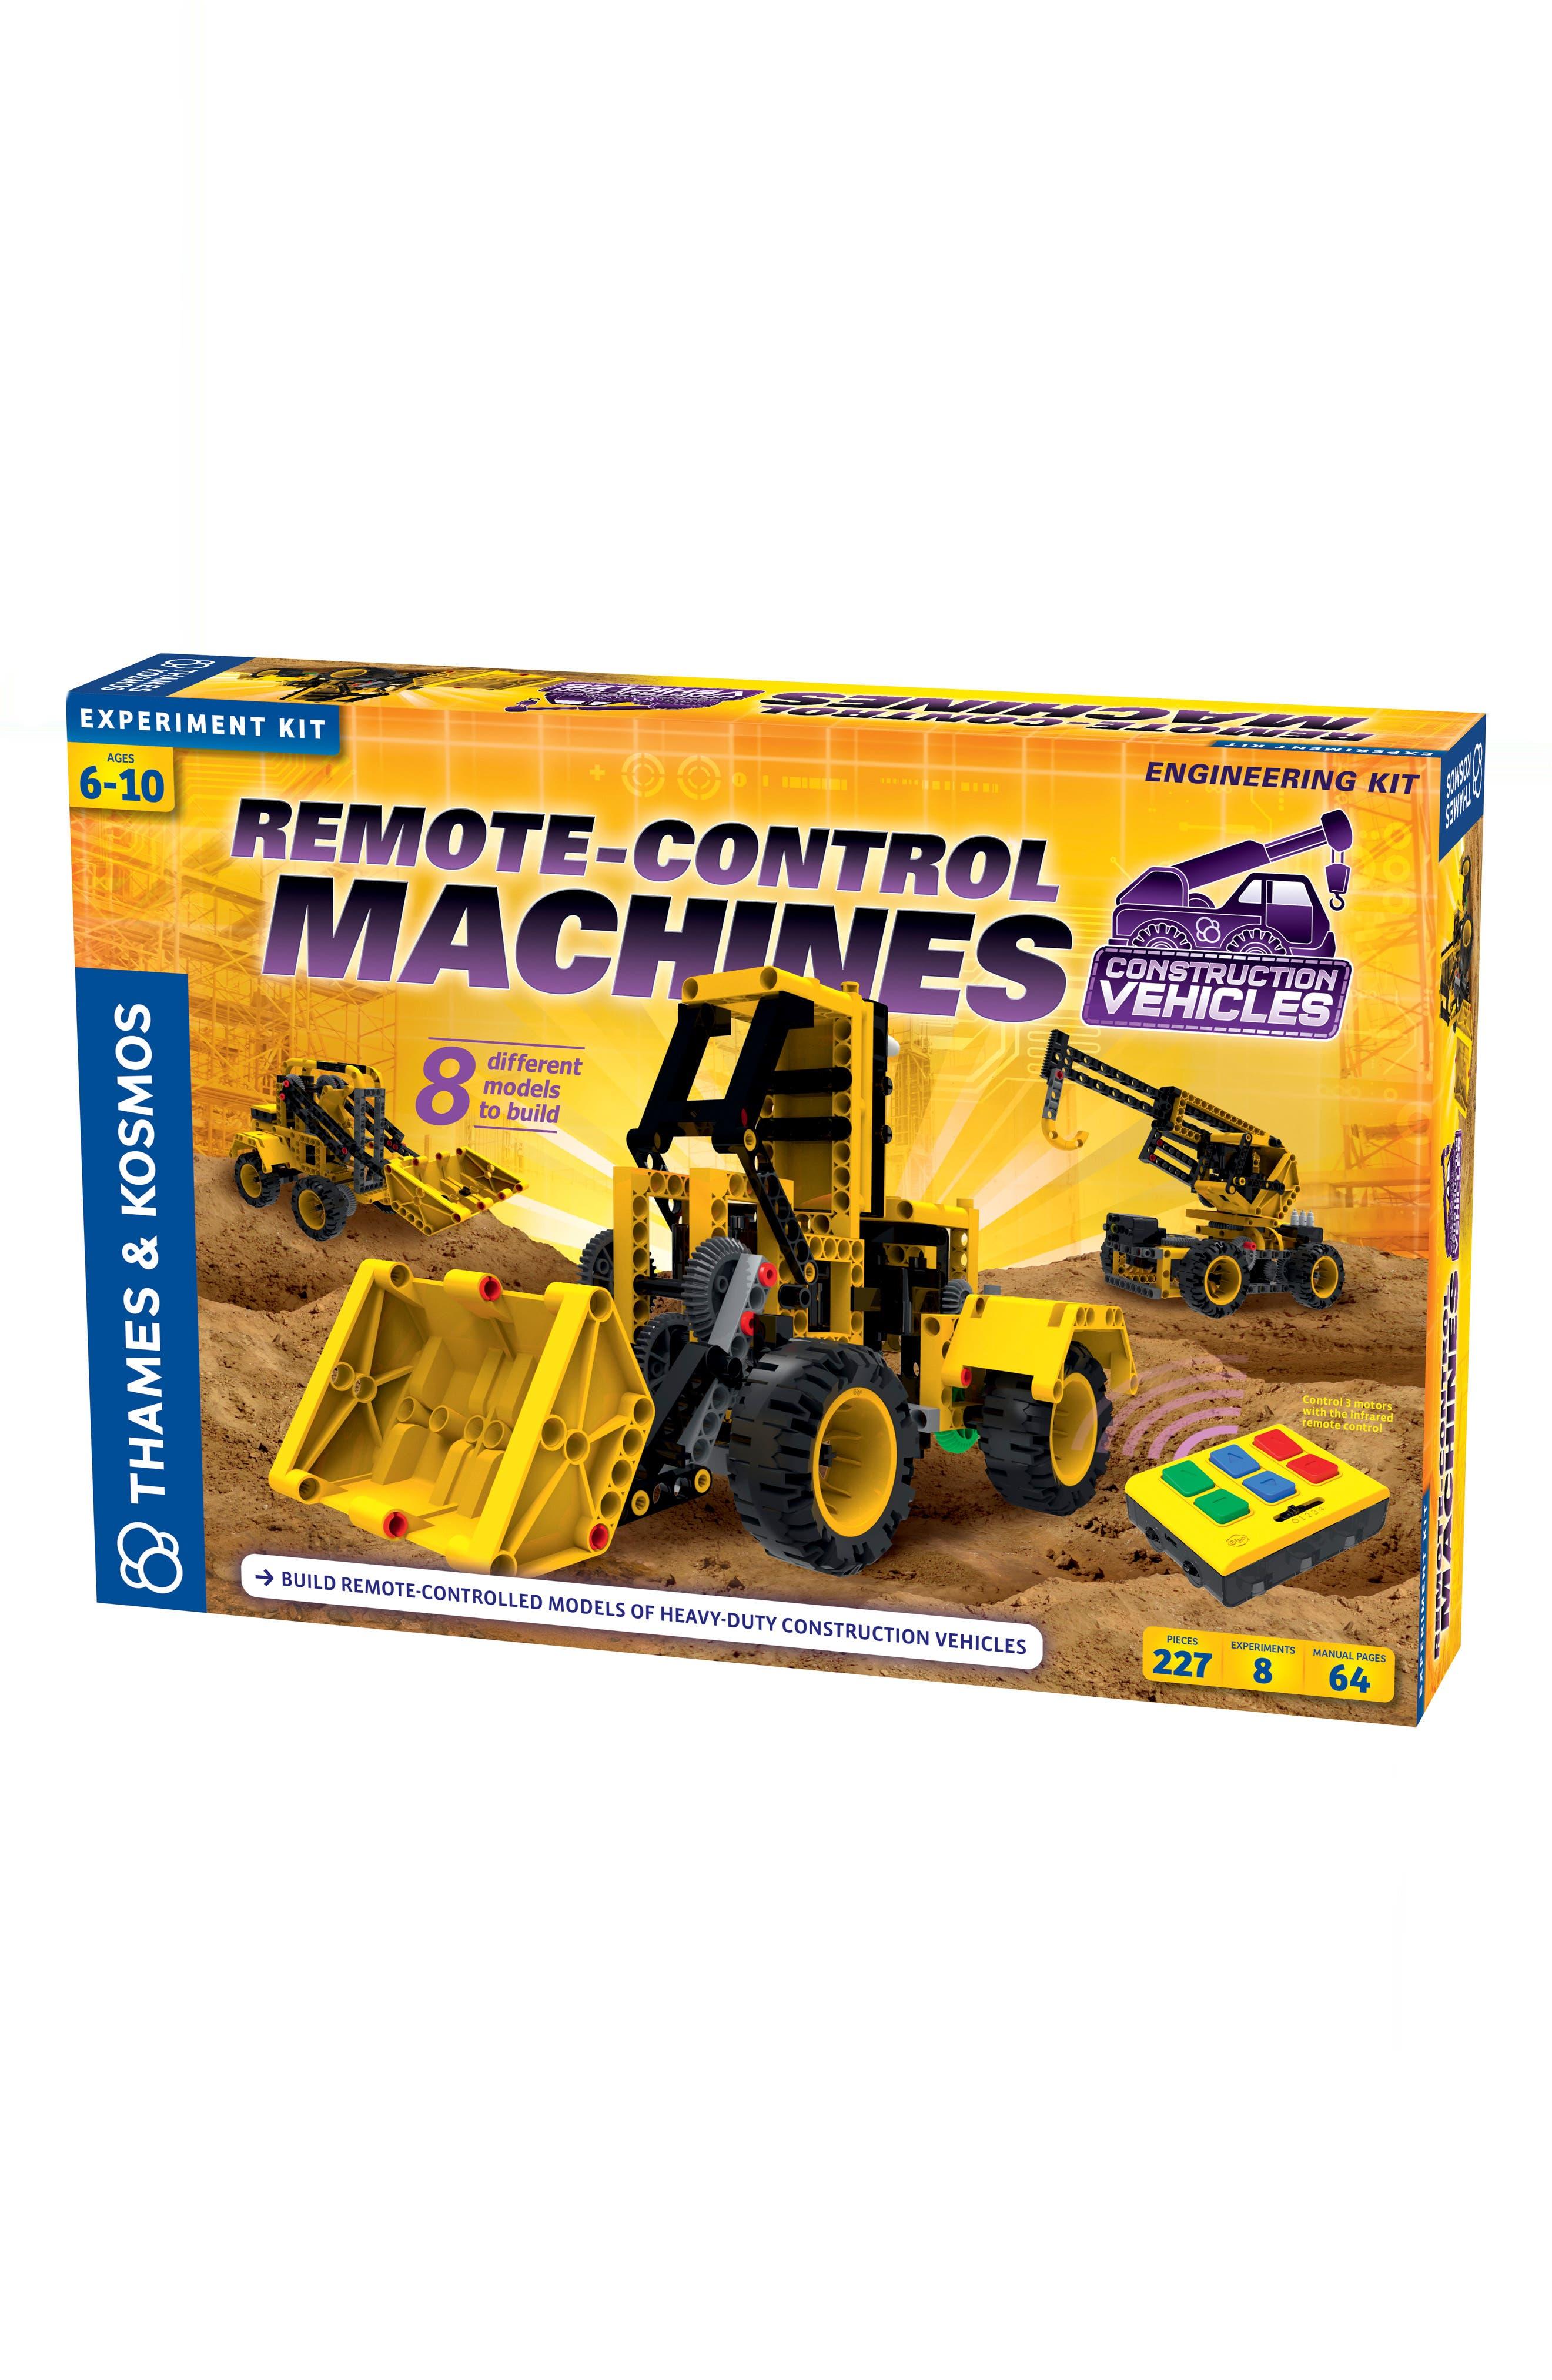 Remote Control Machines Construction Vehicles Kit,                             Main thumbnail 1, color,                             MULTI